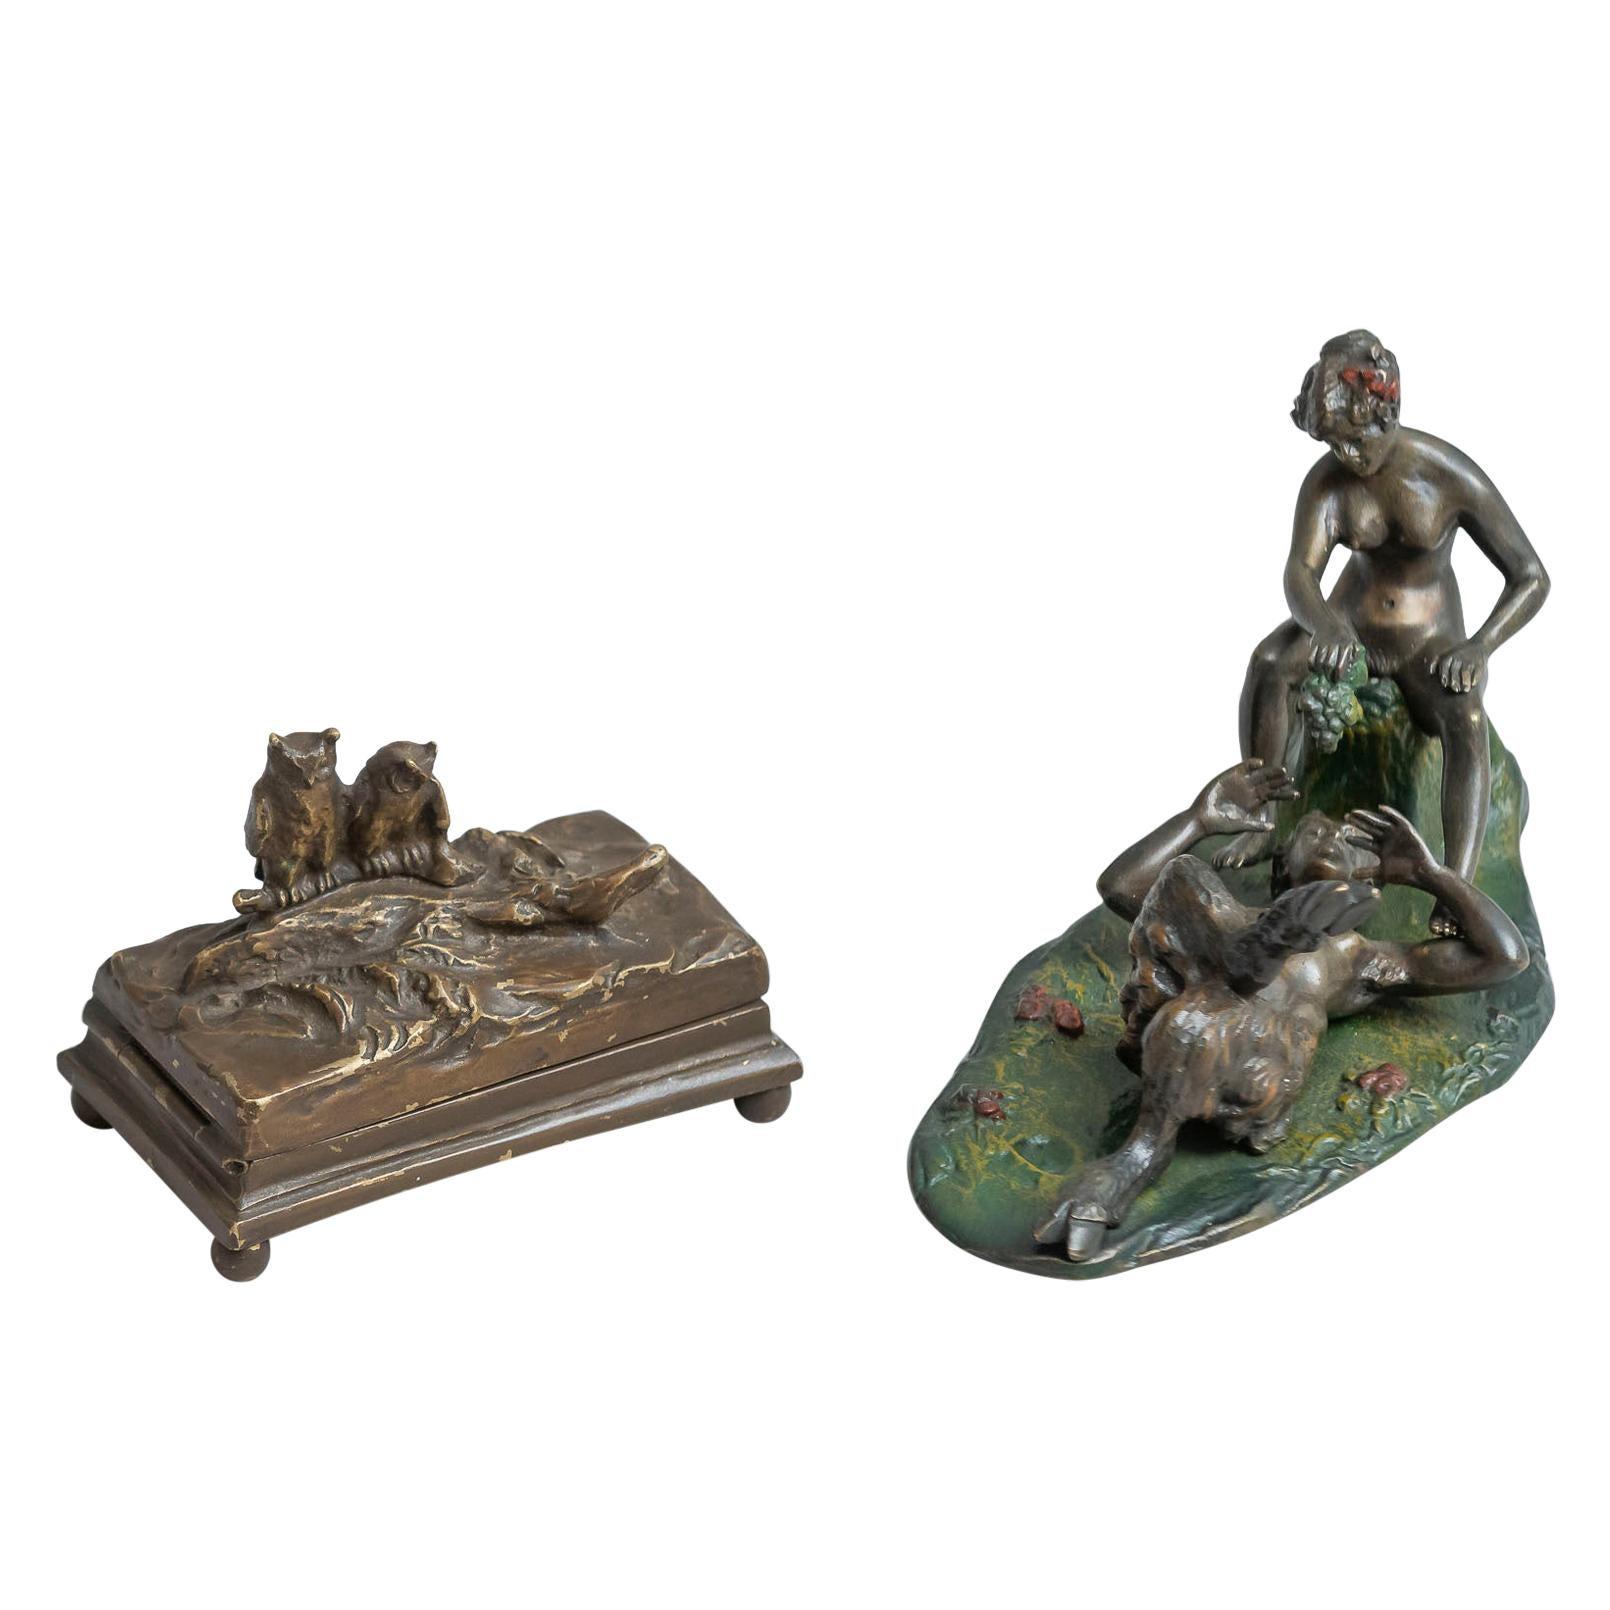 2 Austrian Movable Naughty, Erotic Bronzes, circa 1920